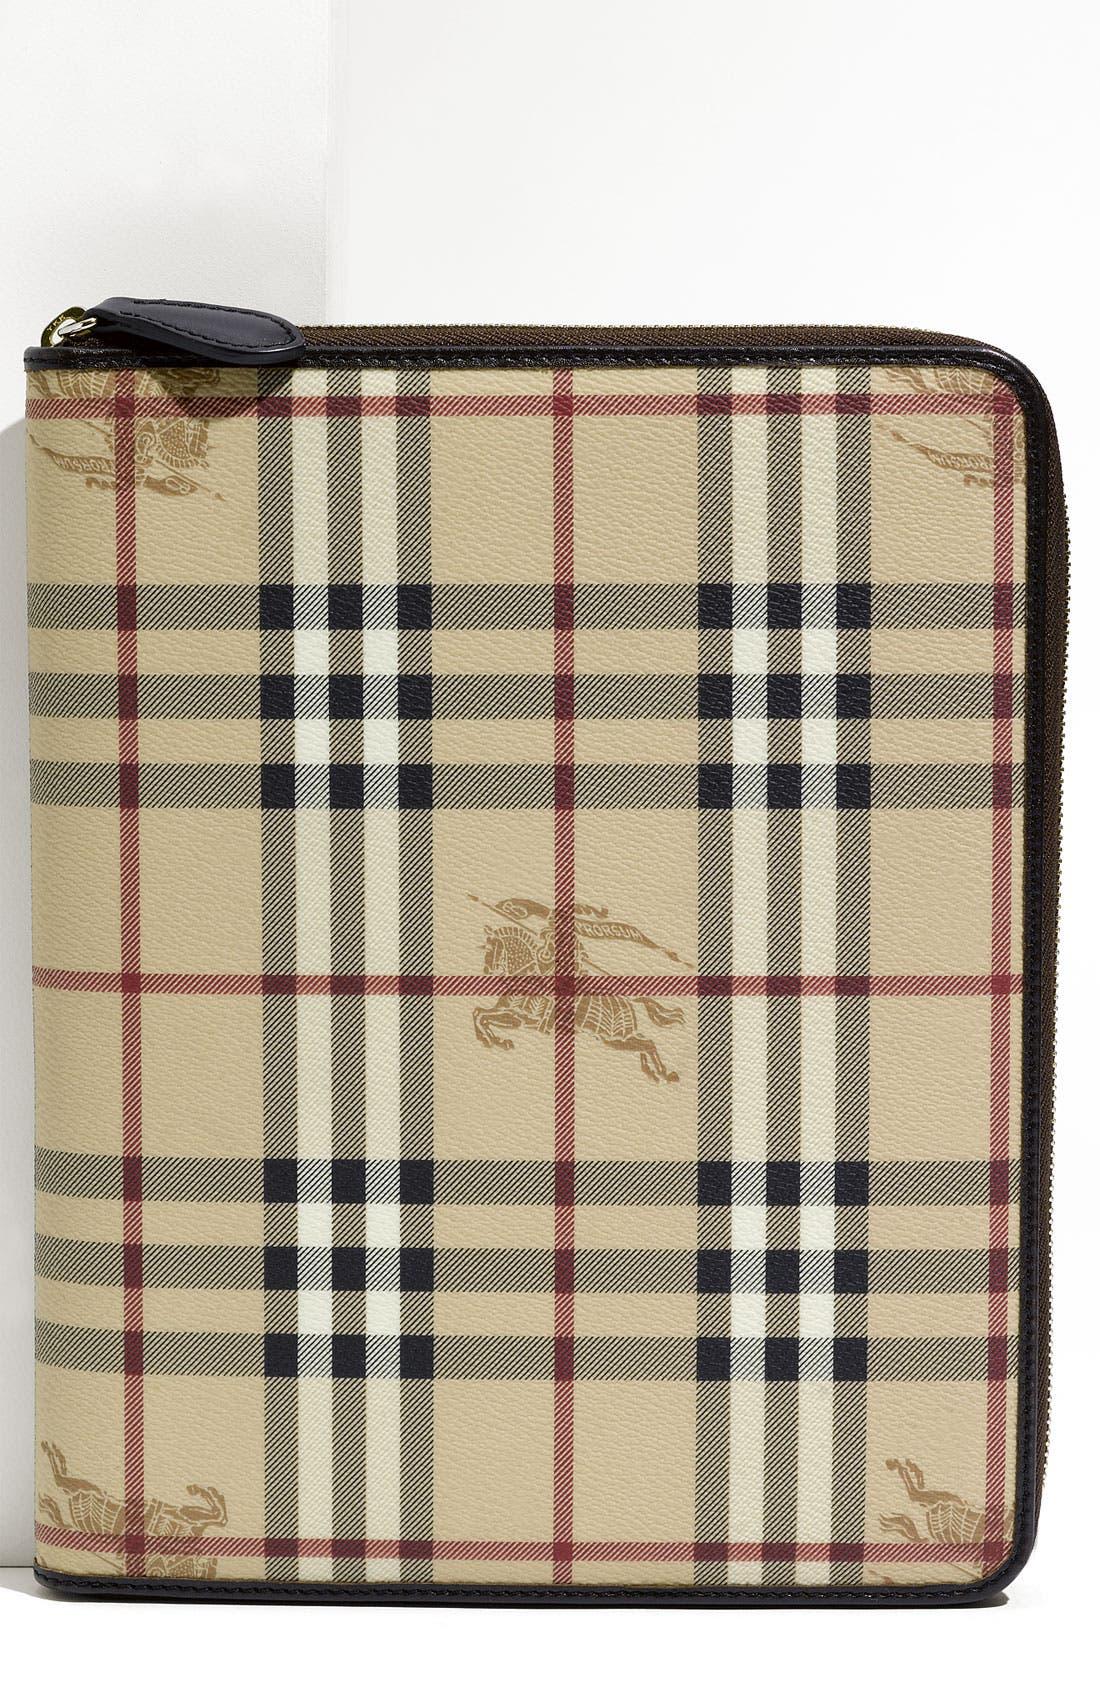 Alternate Image 1 Selected - Burberry 'Haymarket Check' Zip Around iPad 2 Case